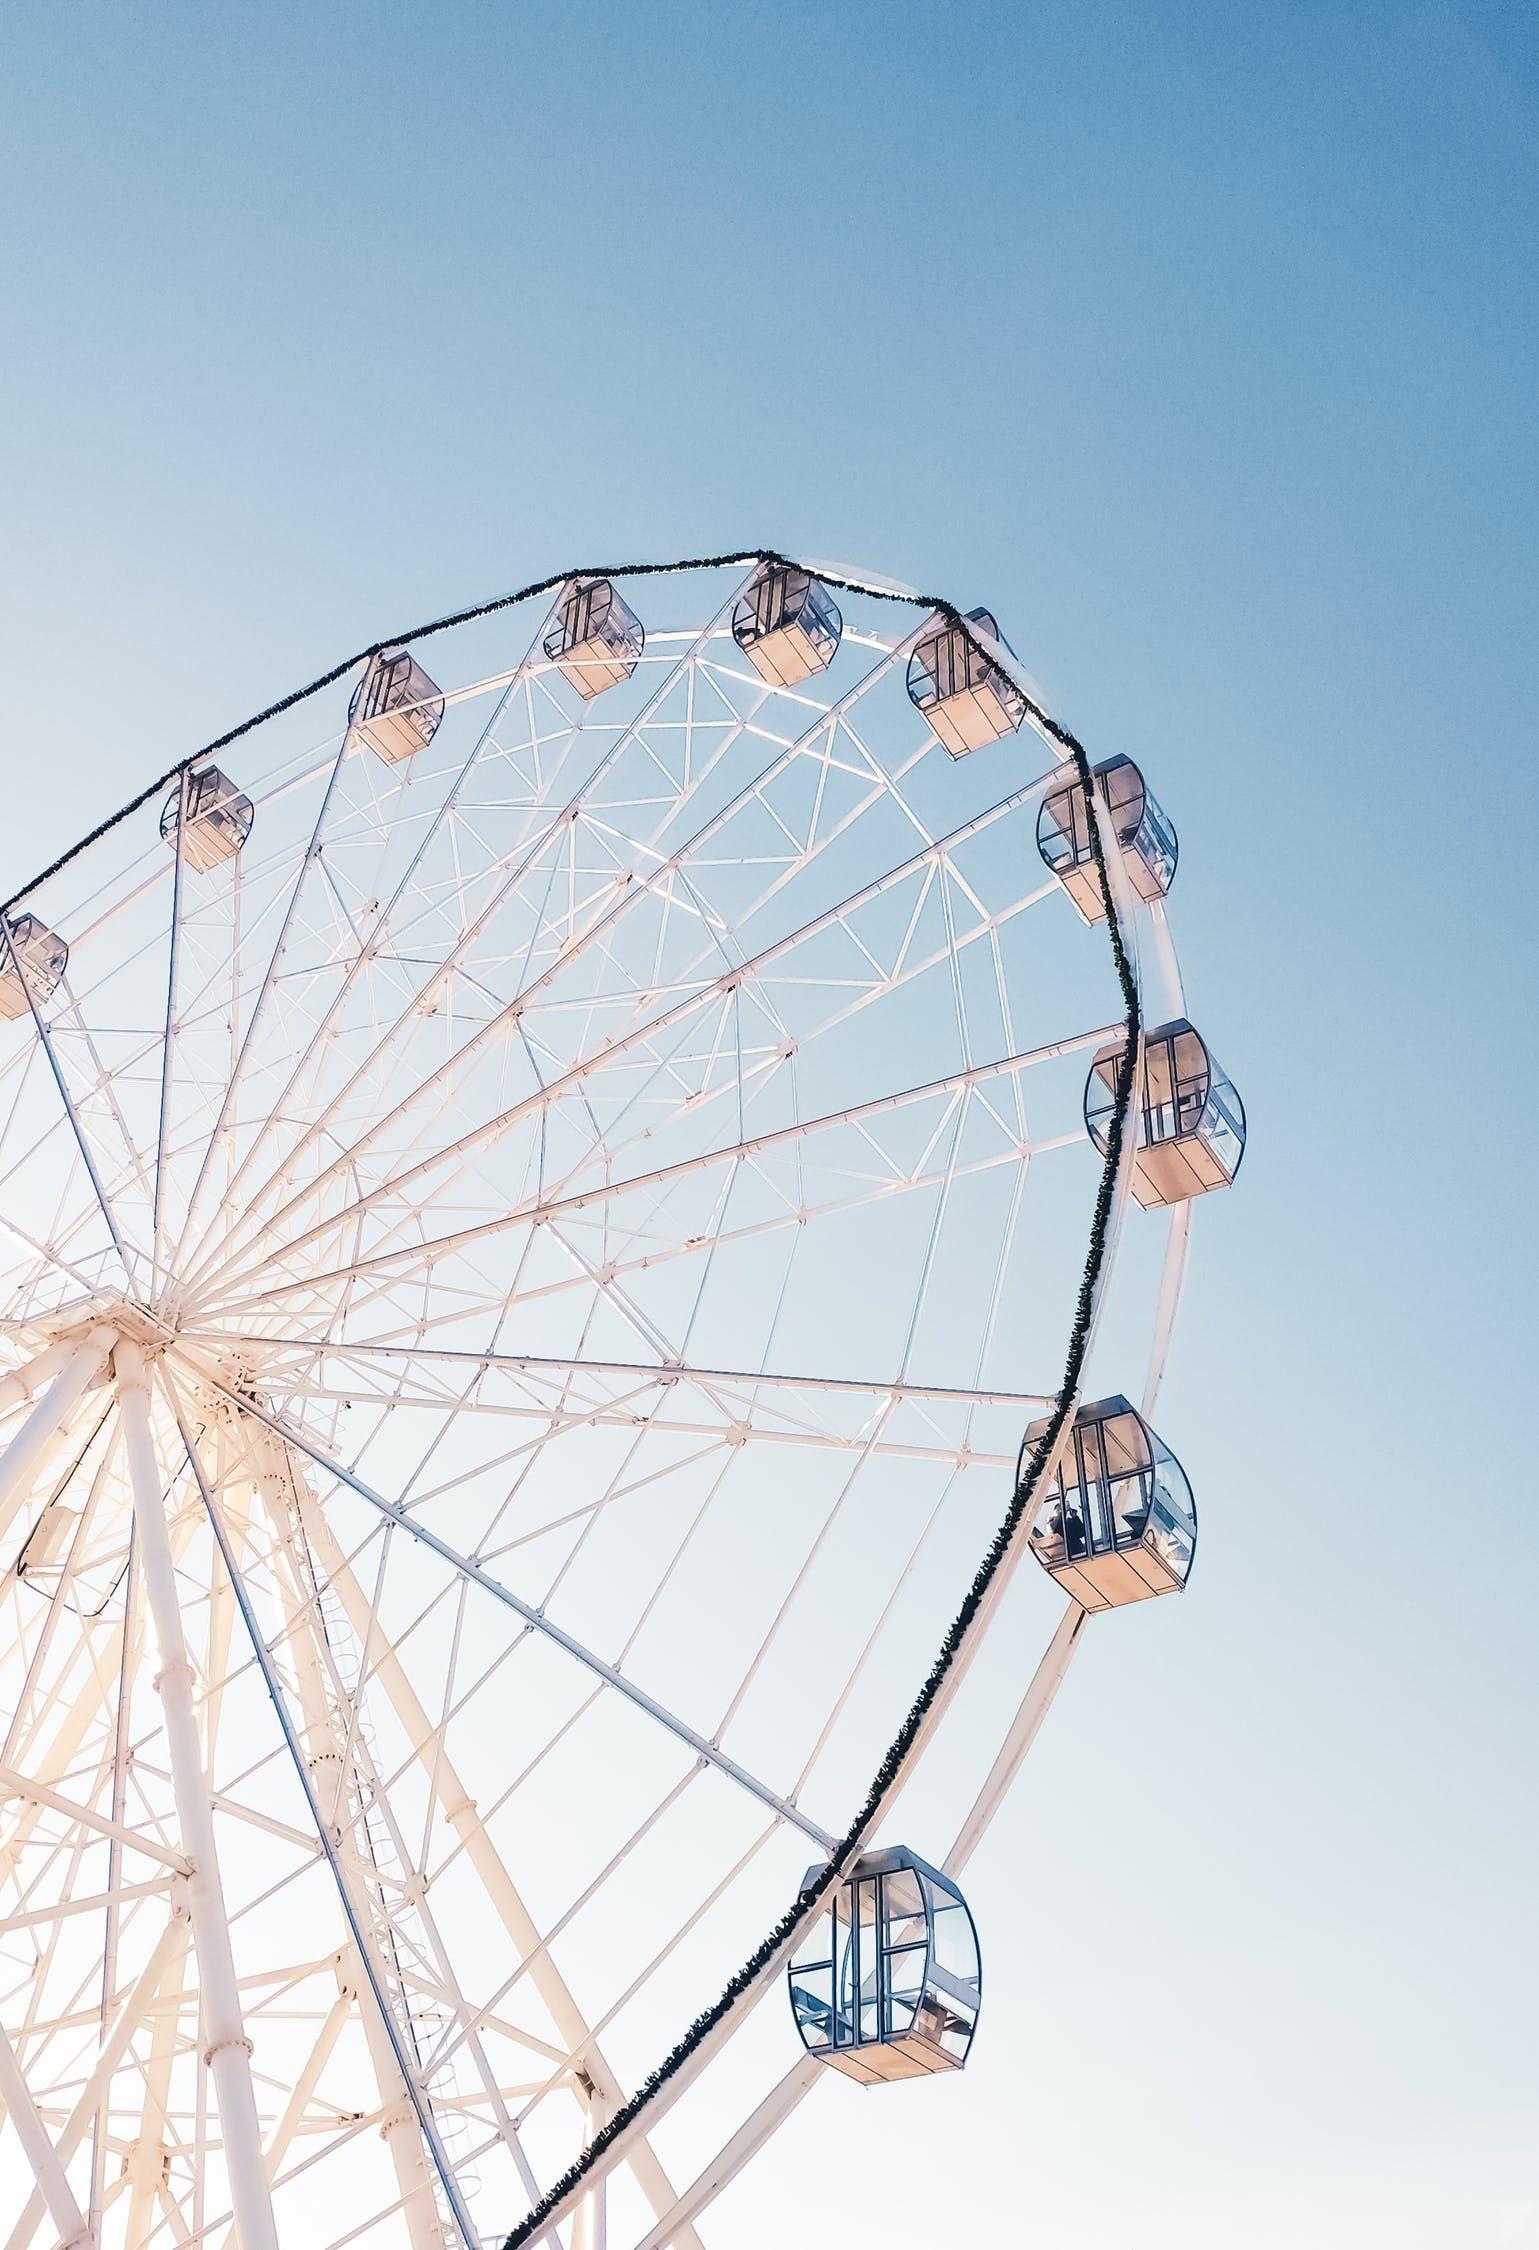 10,000+ Best Ferris Wheel Photos · 100% Free Download · Pexels Stock Photos